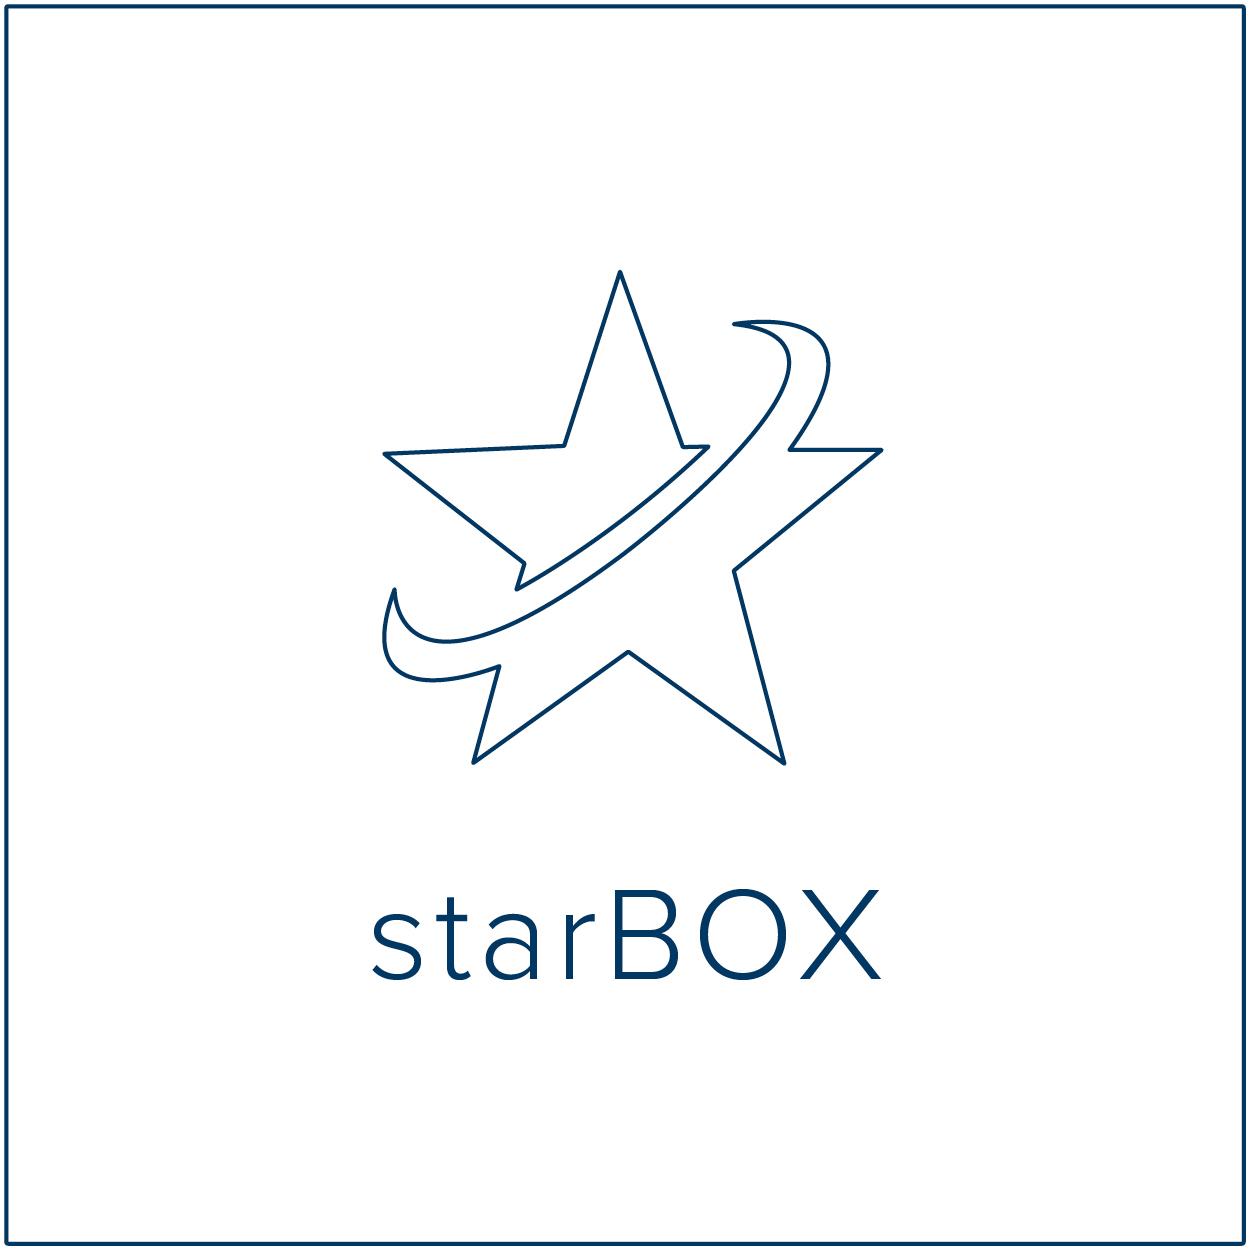 SPB_trainingsBOX_icon_017.jpg